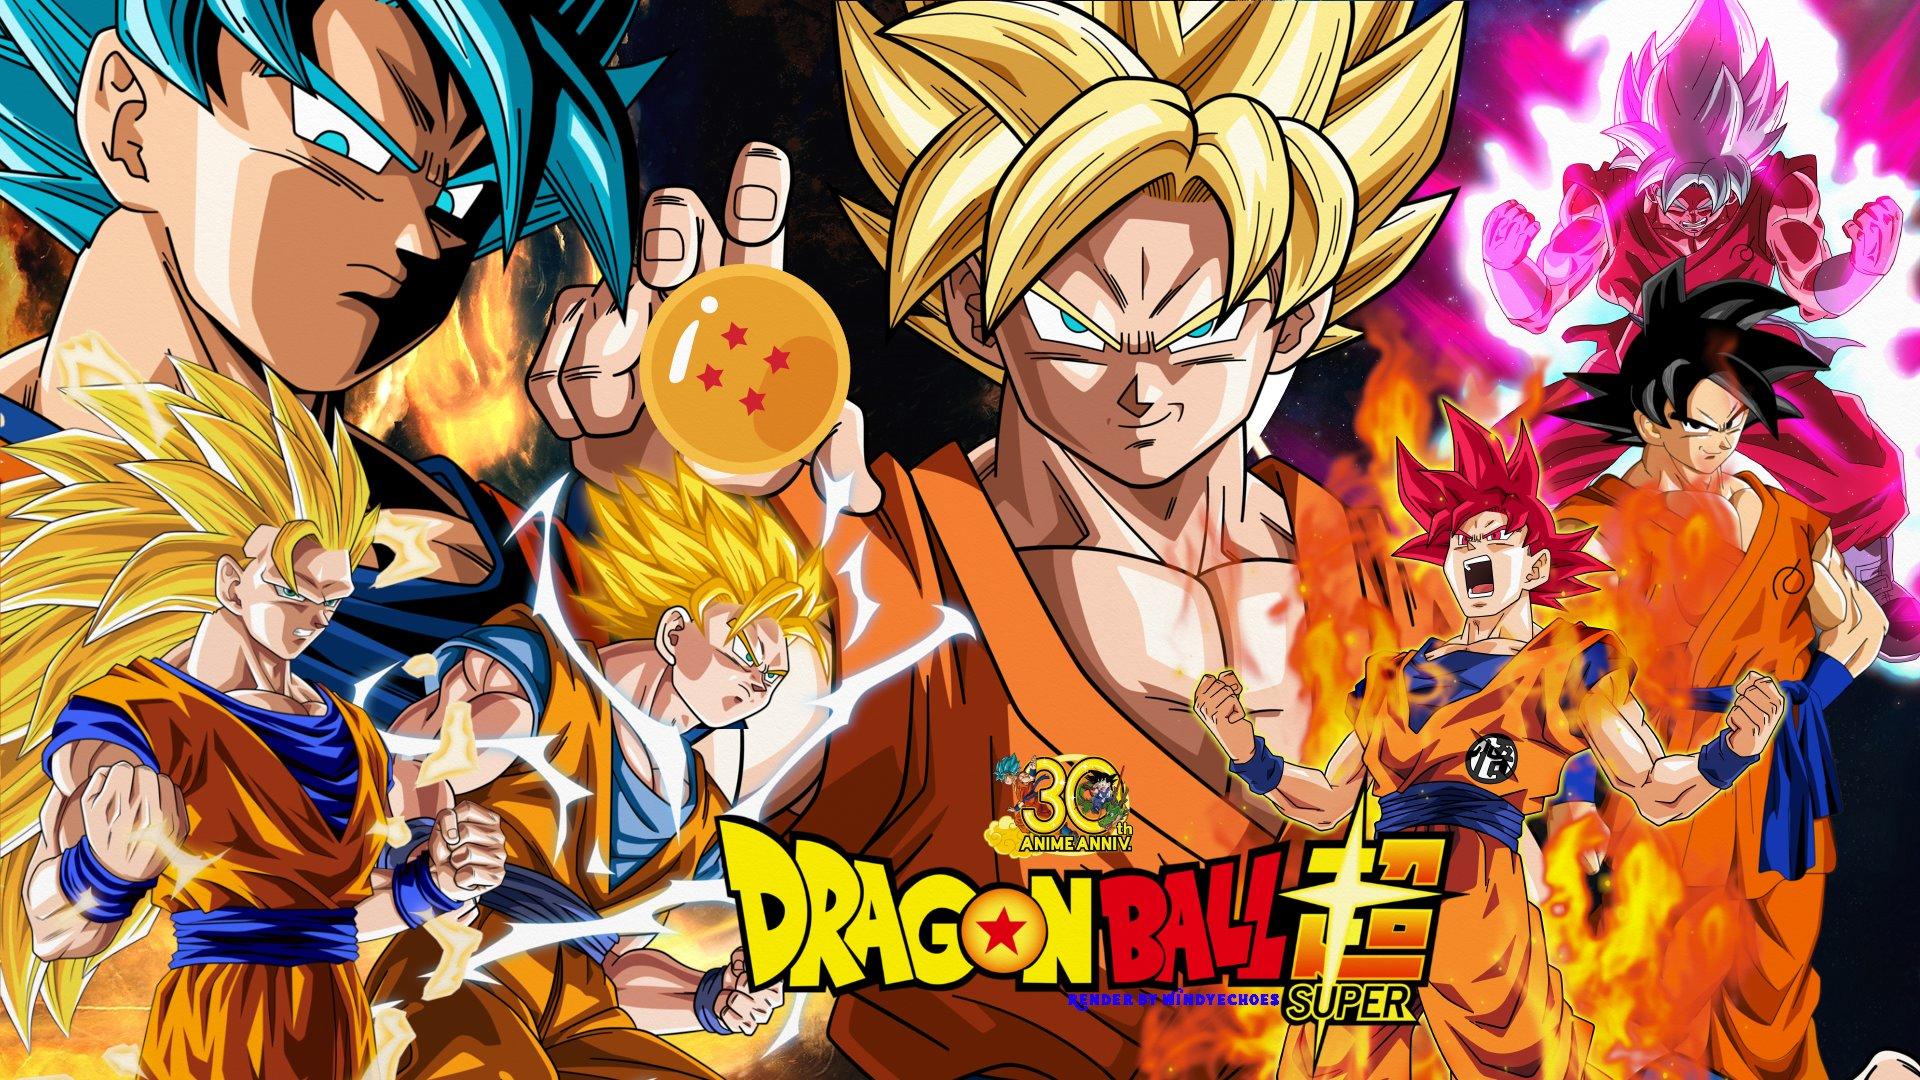 Dragon Ball Super wolpeyper 2017